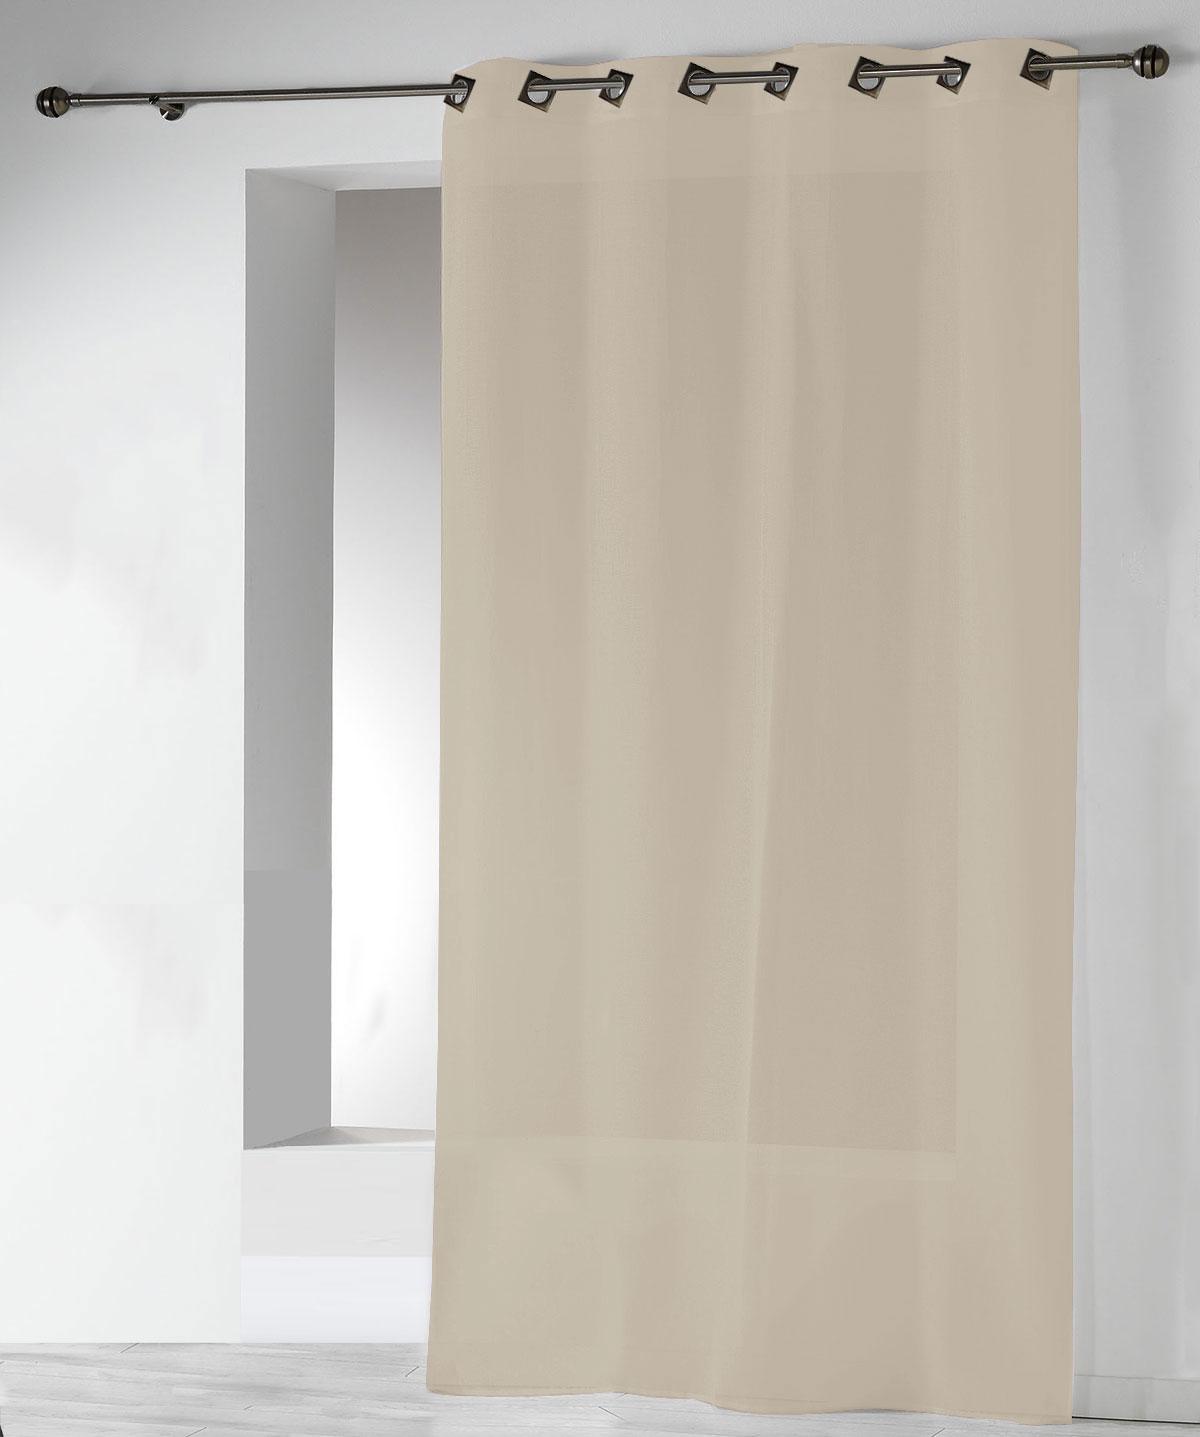 Visillos Lisos en Estameña con Ollaos (Crema)